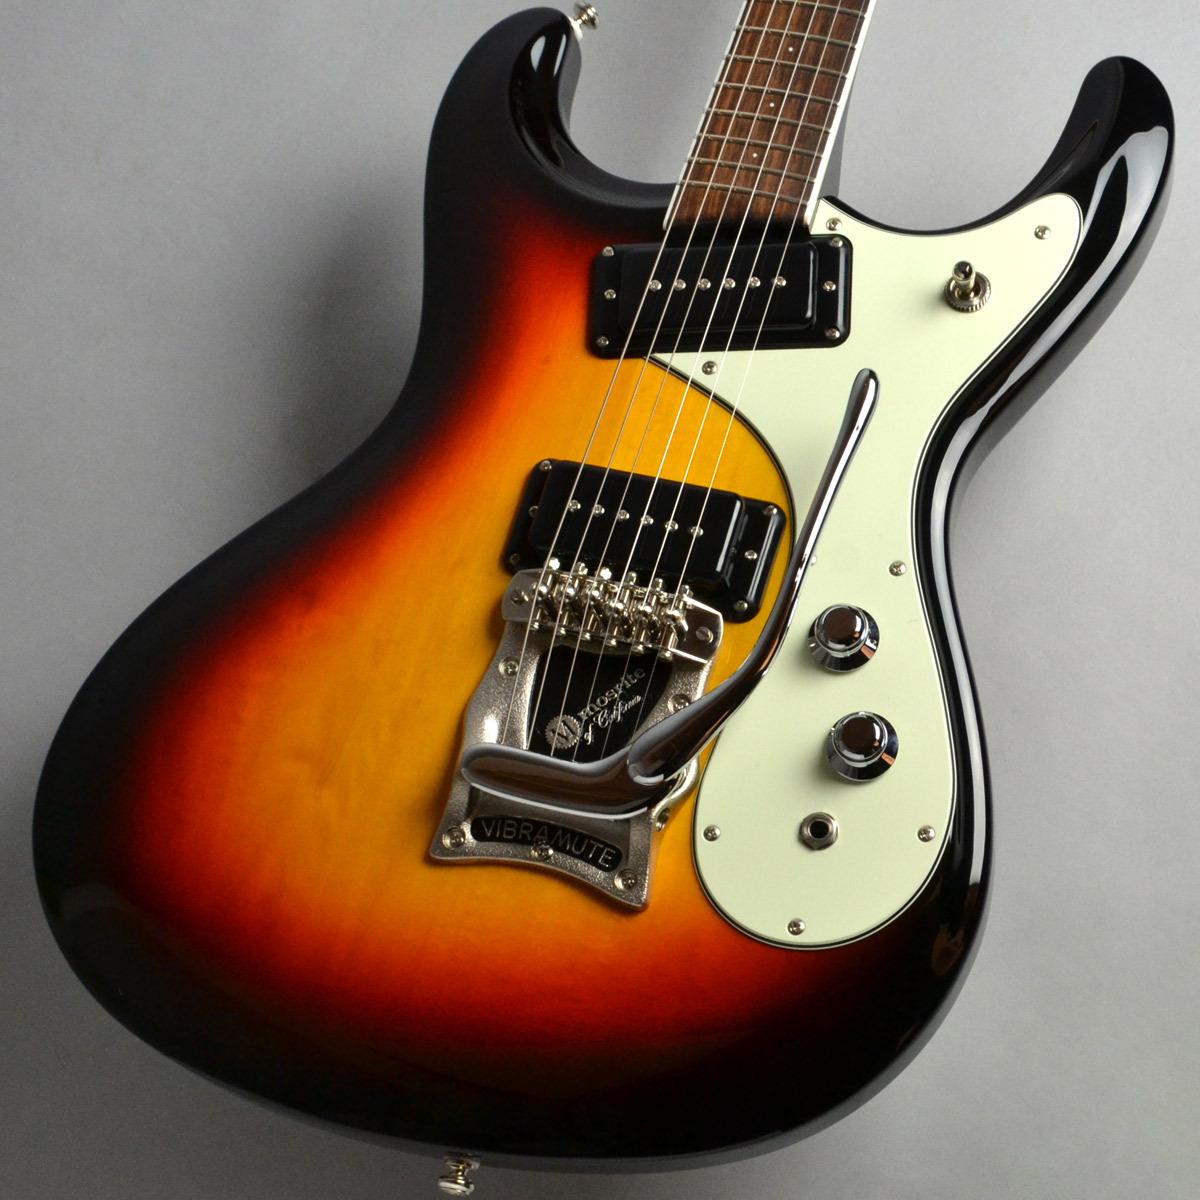 mosrite Sunburst Super Custom Custom 65 Sunburst w mosrite/C-230 エレキギター/C-230ハードケース付属【モズライト】【新宿PePe店】, 野尻町:982f744a --- sunward.msk.ru